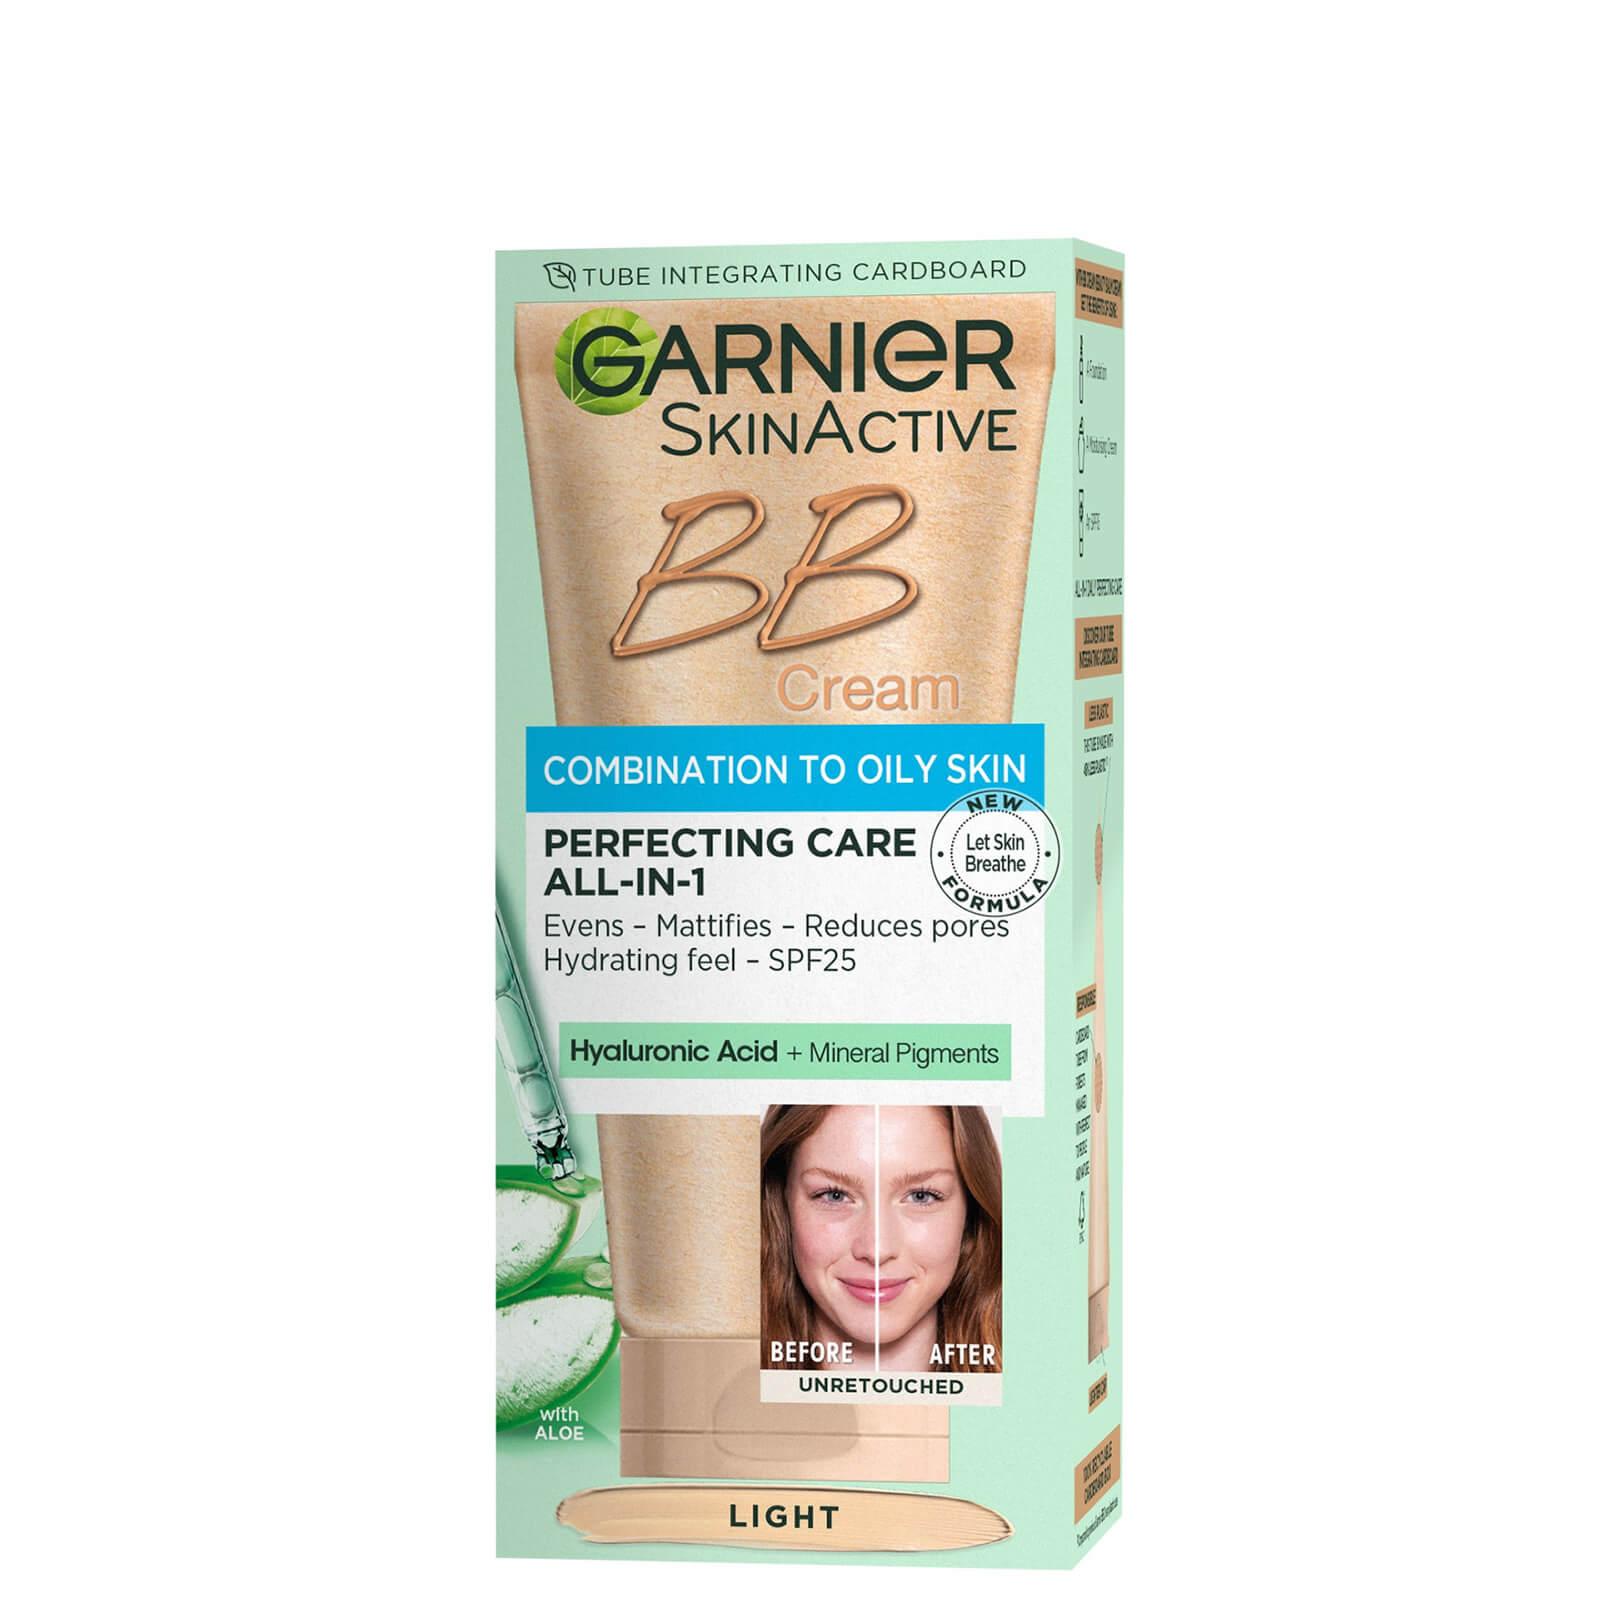 Купить Garnier BB Cream Oil Free Tinted Moisturiser (Various Shades) - Light